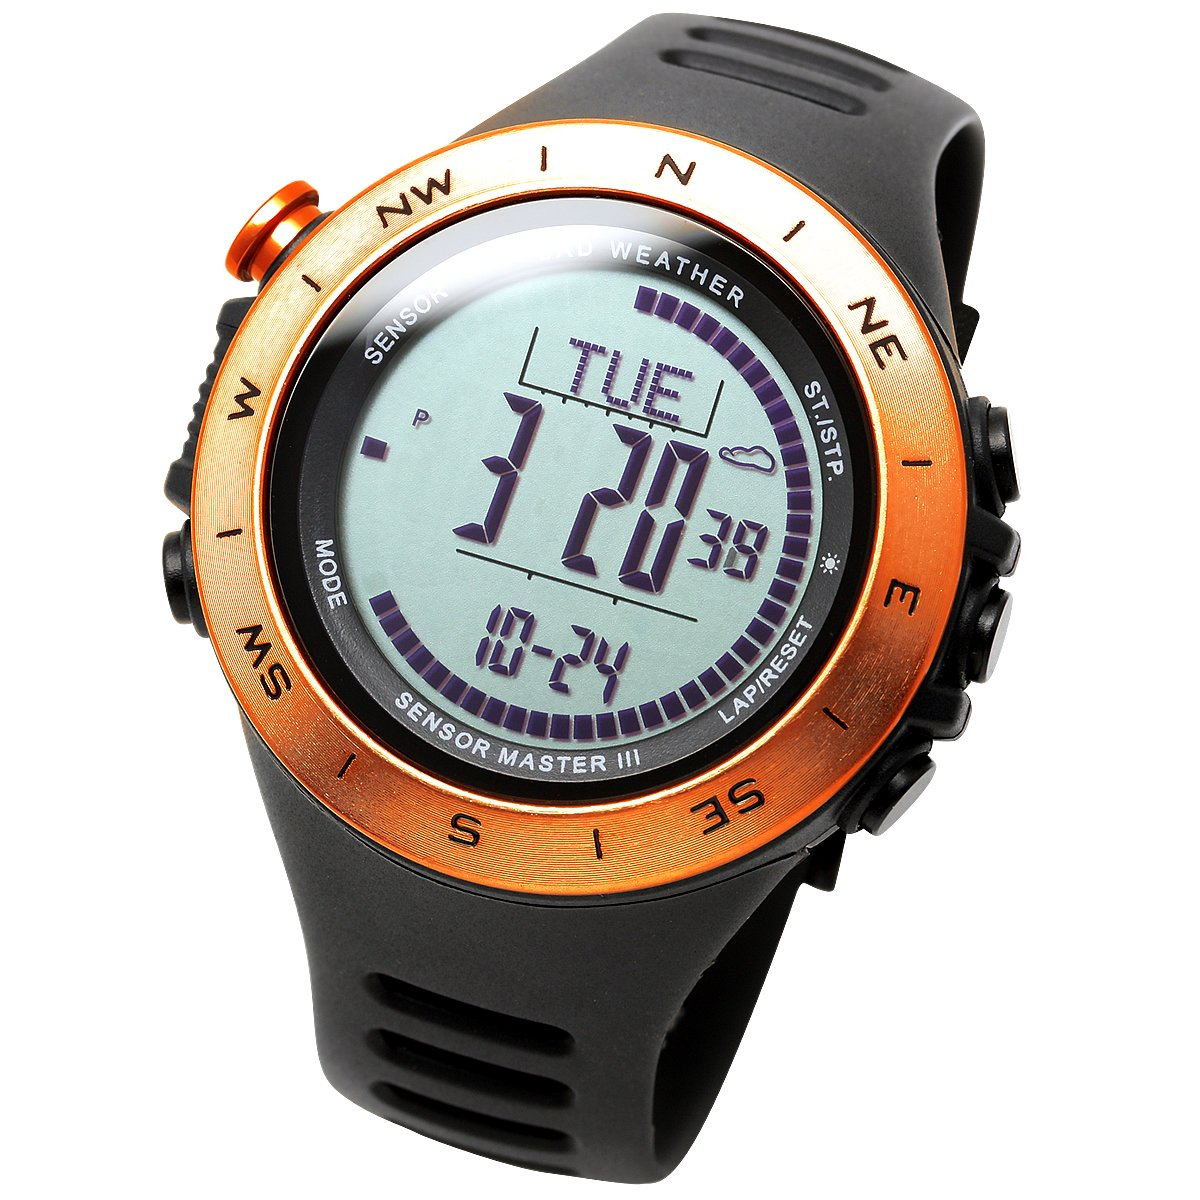 [Lad Weather? Swiss Sensor 100m resistente al agua altímetro meteorológica (Sunny/nubes/lluvia/Storm) multifunción reloj